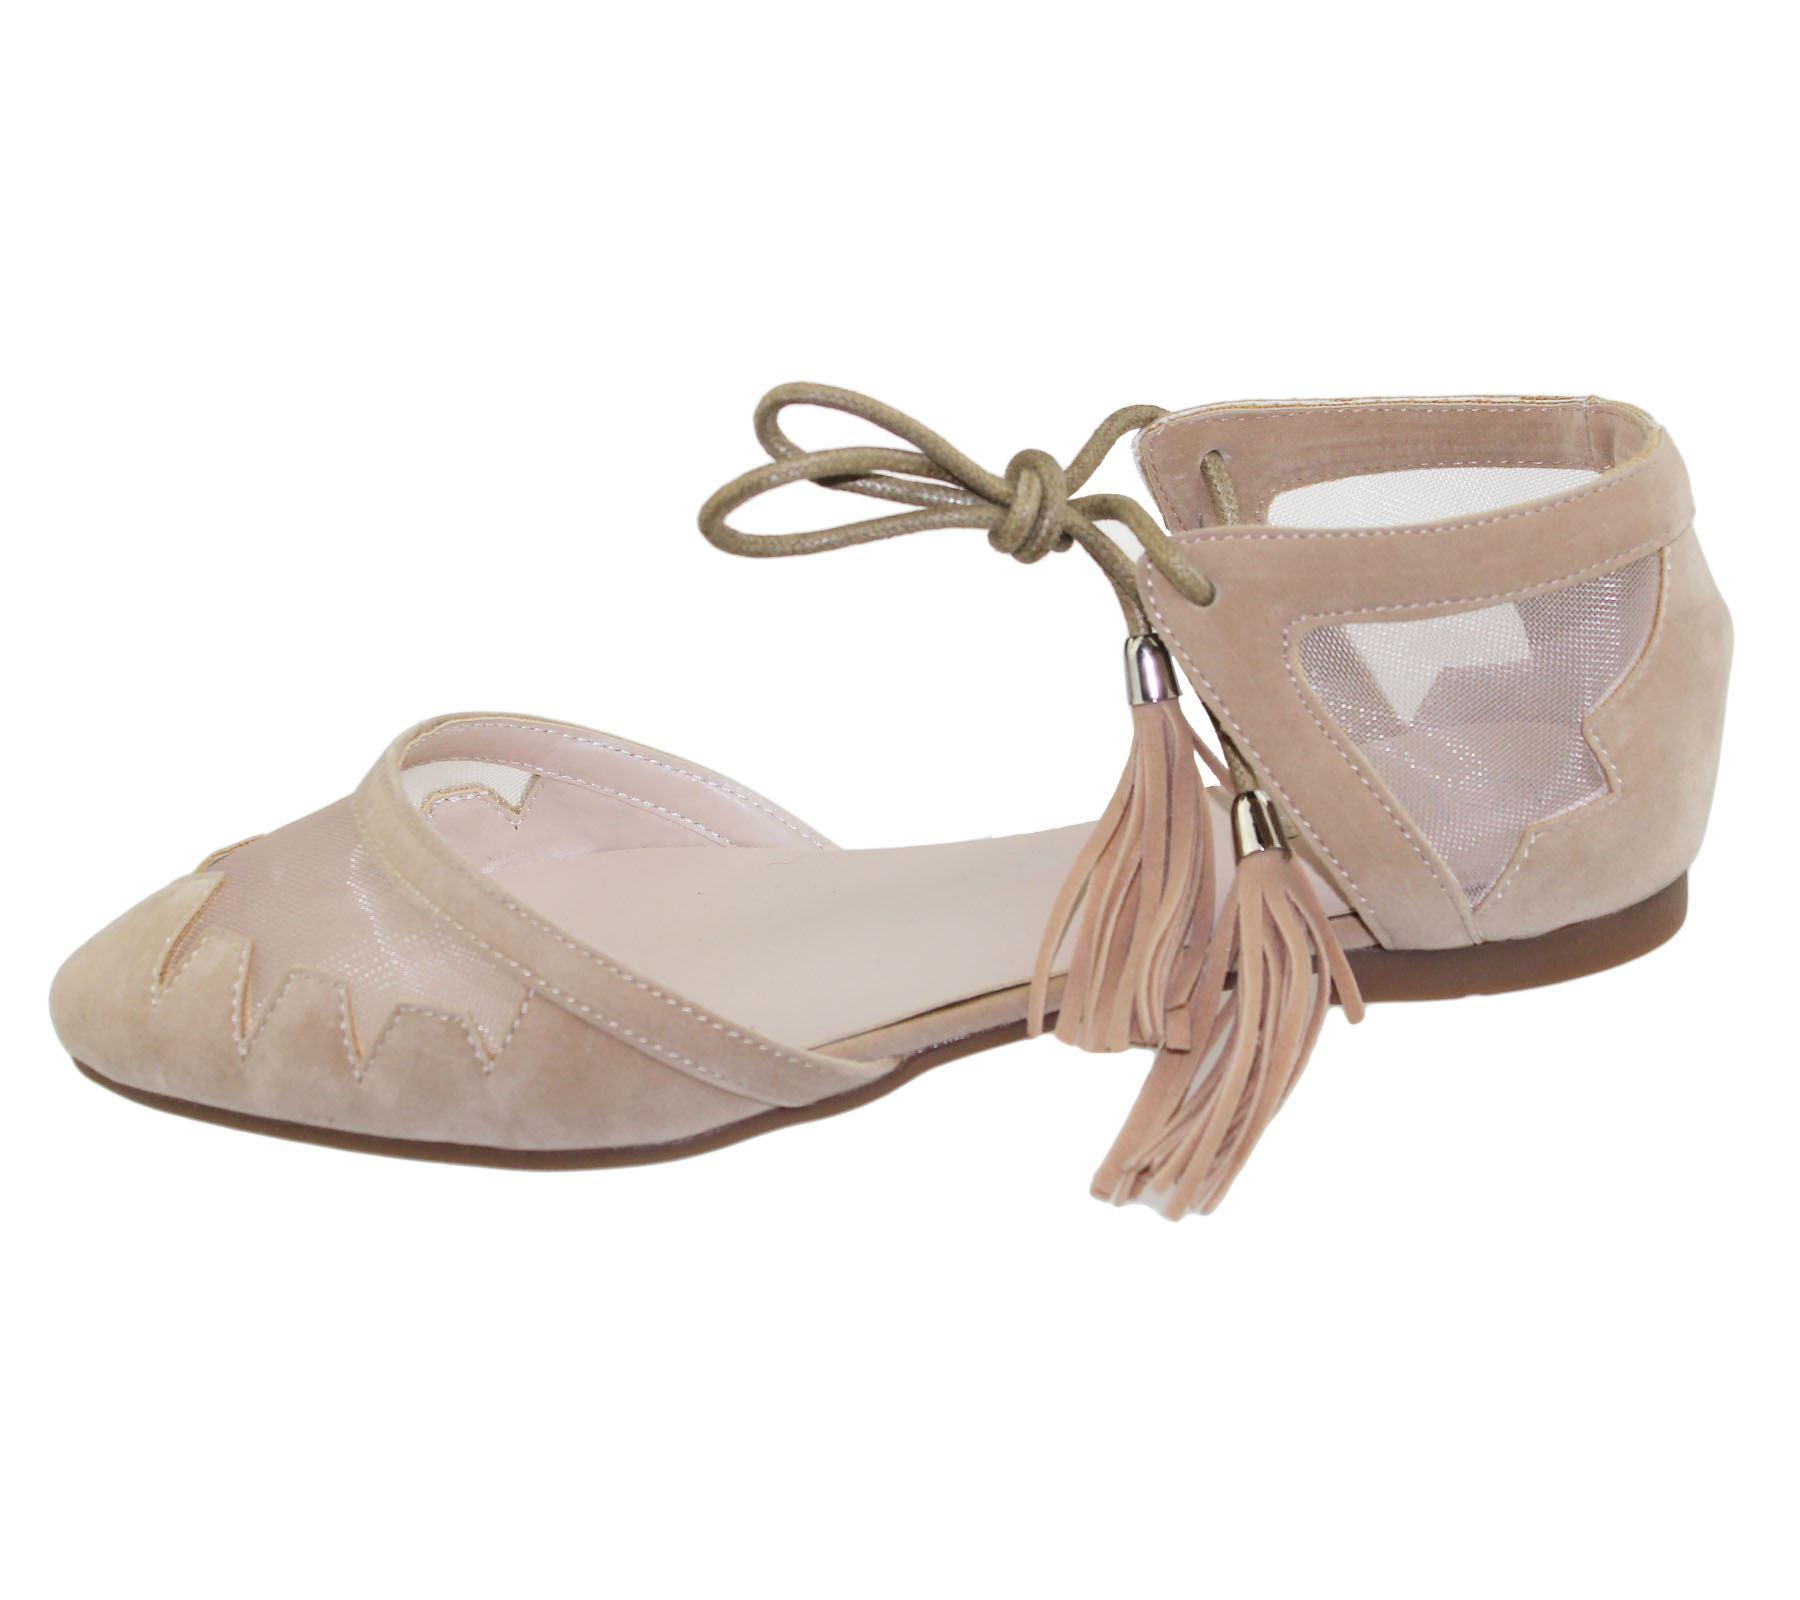 Womens-Flat-Ballerina-Dolly-Pumps-Ballet-Ladies-Summer-Mesh-Tassel-Shoes-Sandals thumbnail 10